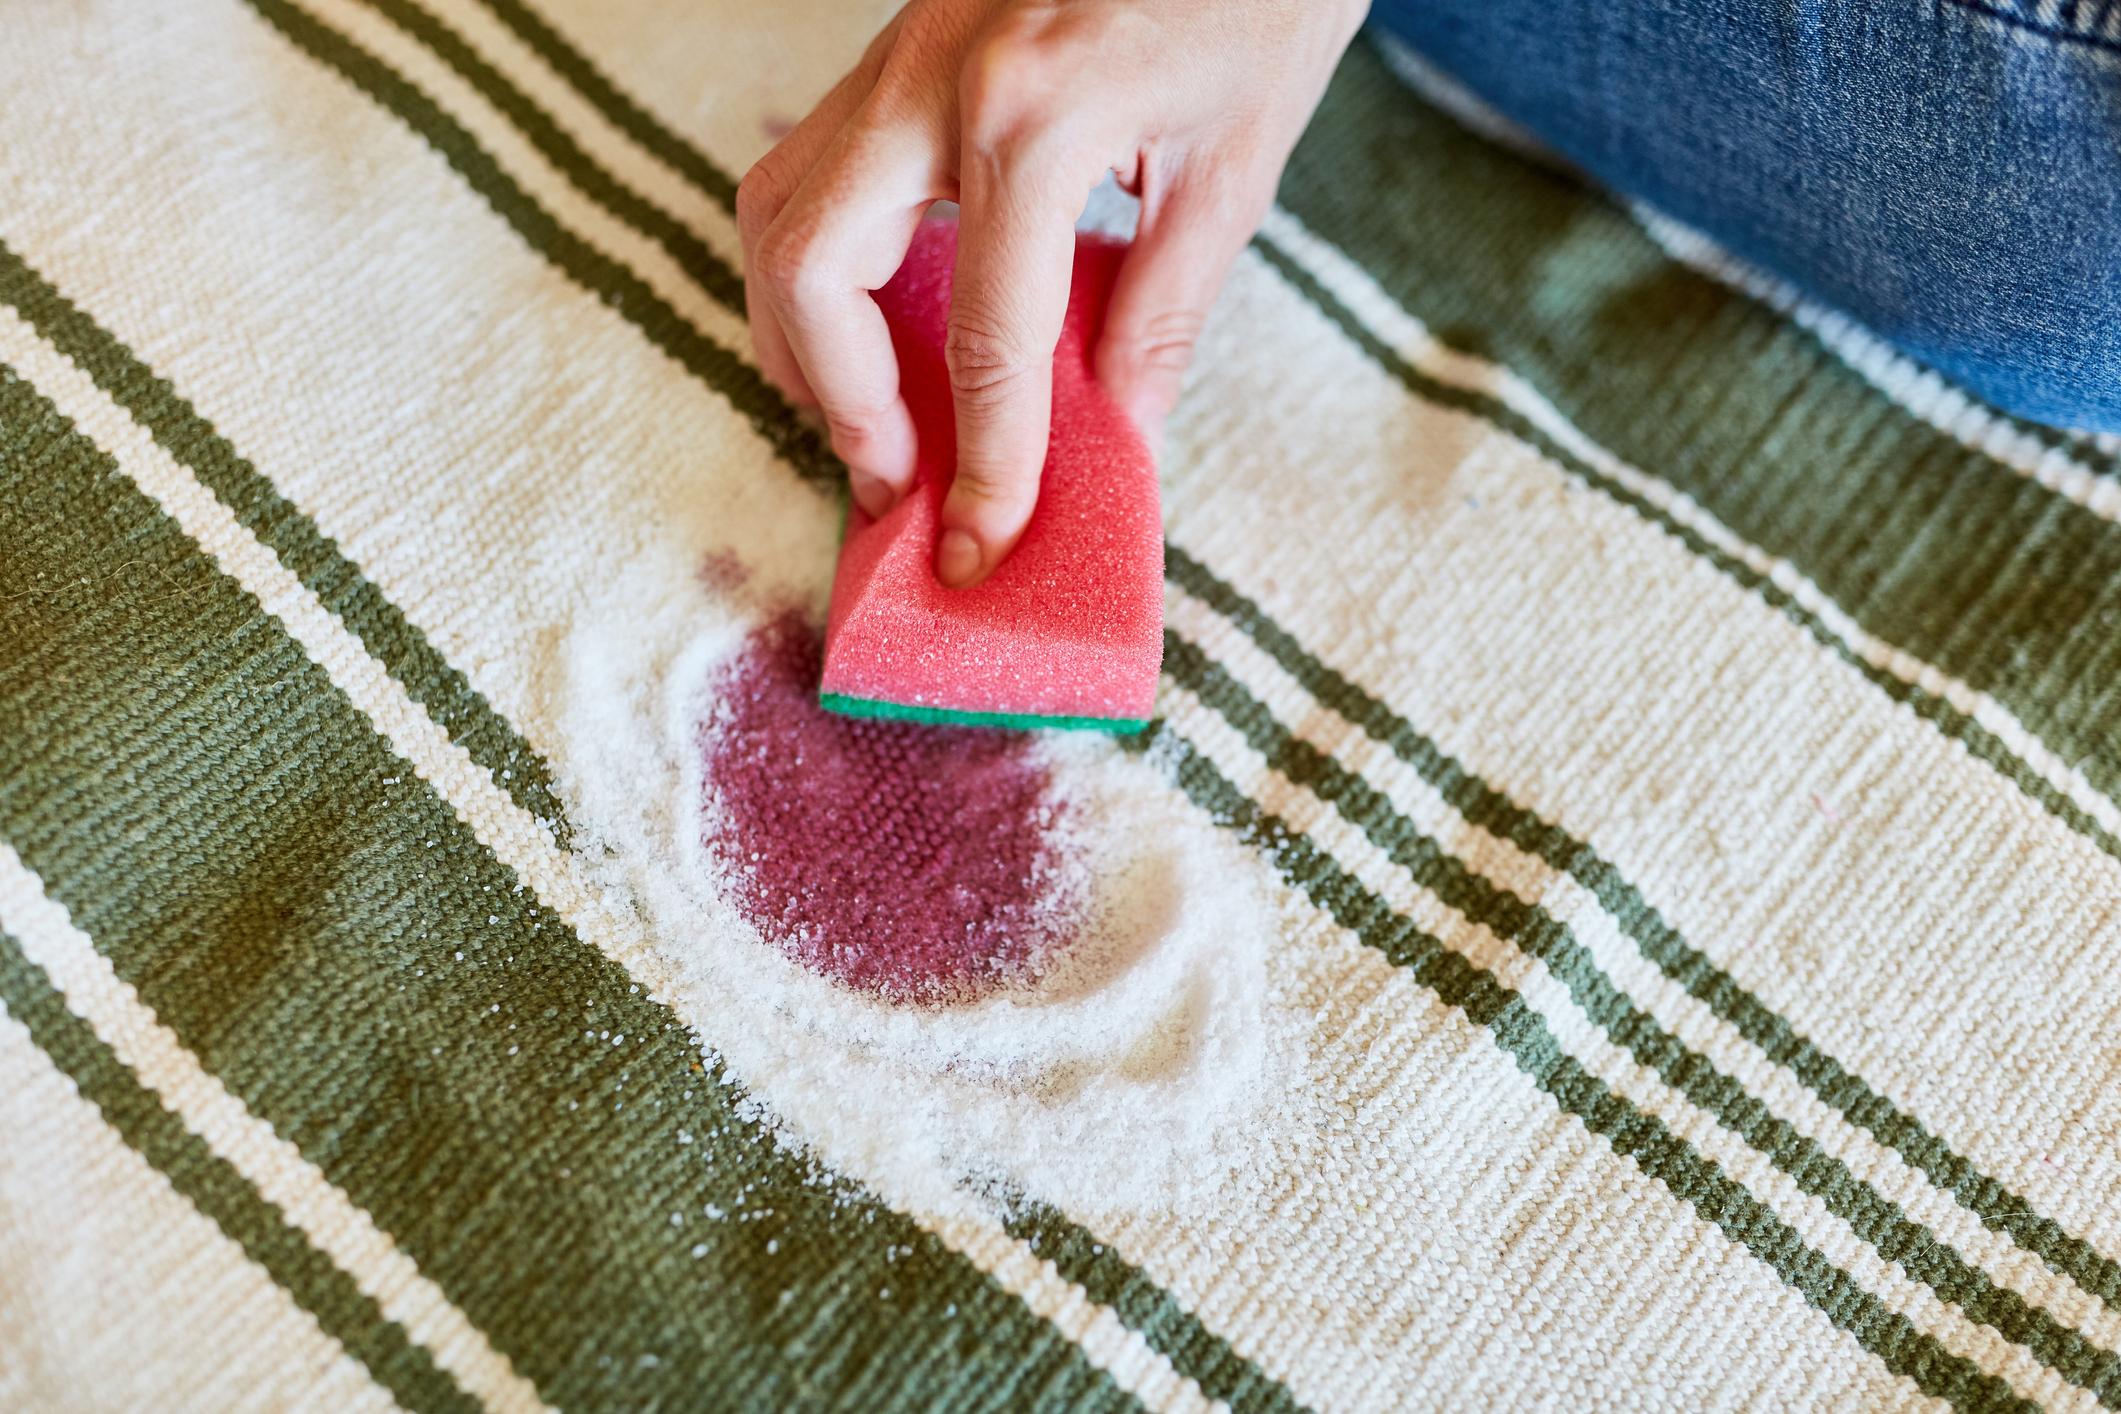 Selain untuk Masak, Ini 8 Manfaat Garam di Rumah!